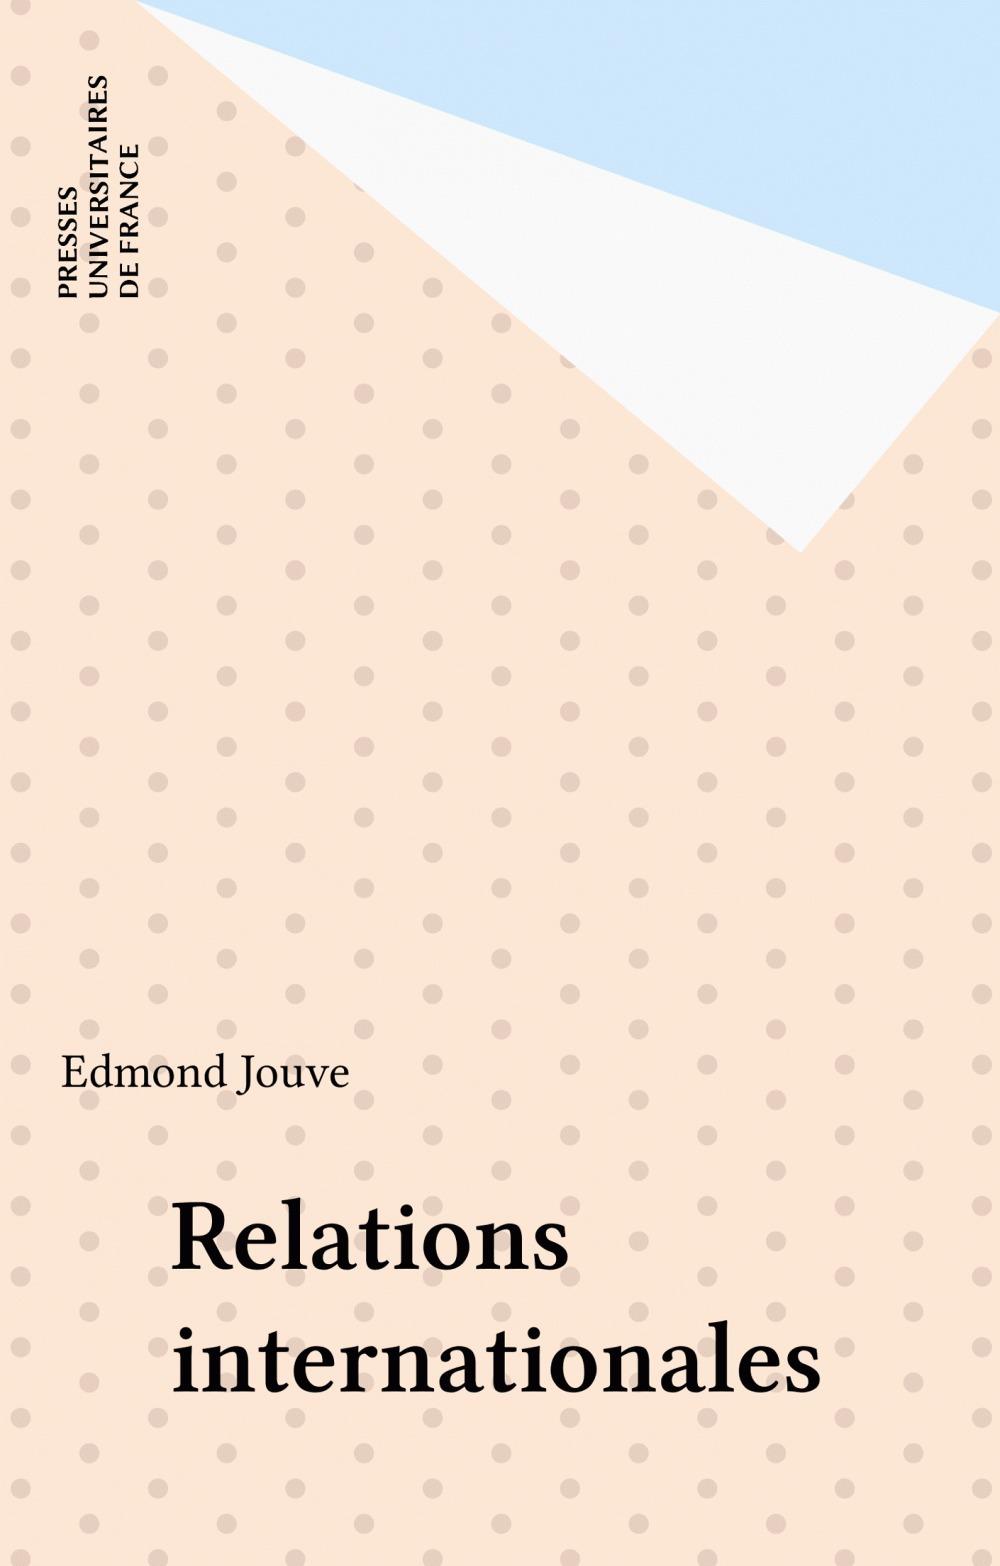 Edmond Jouve Relations internationales